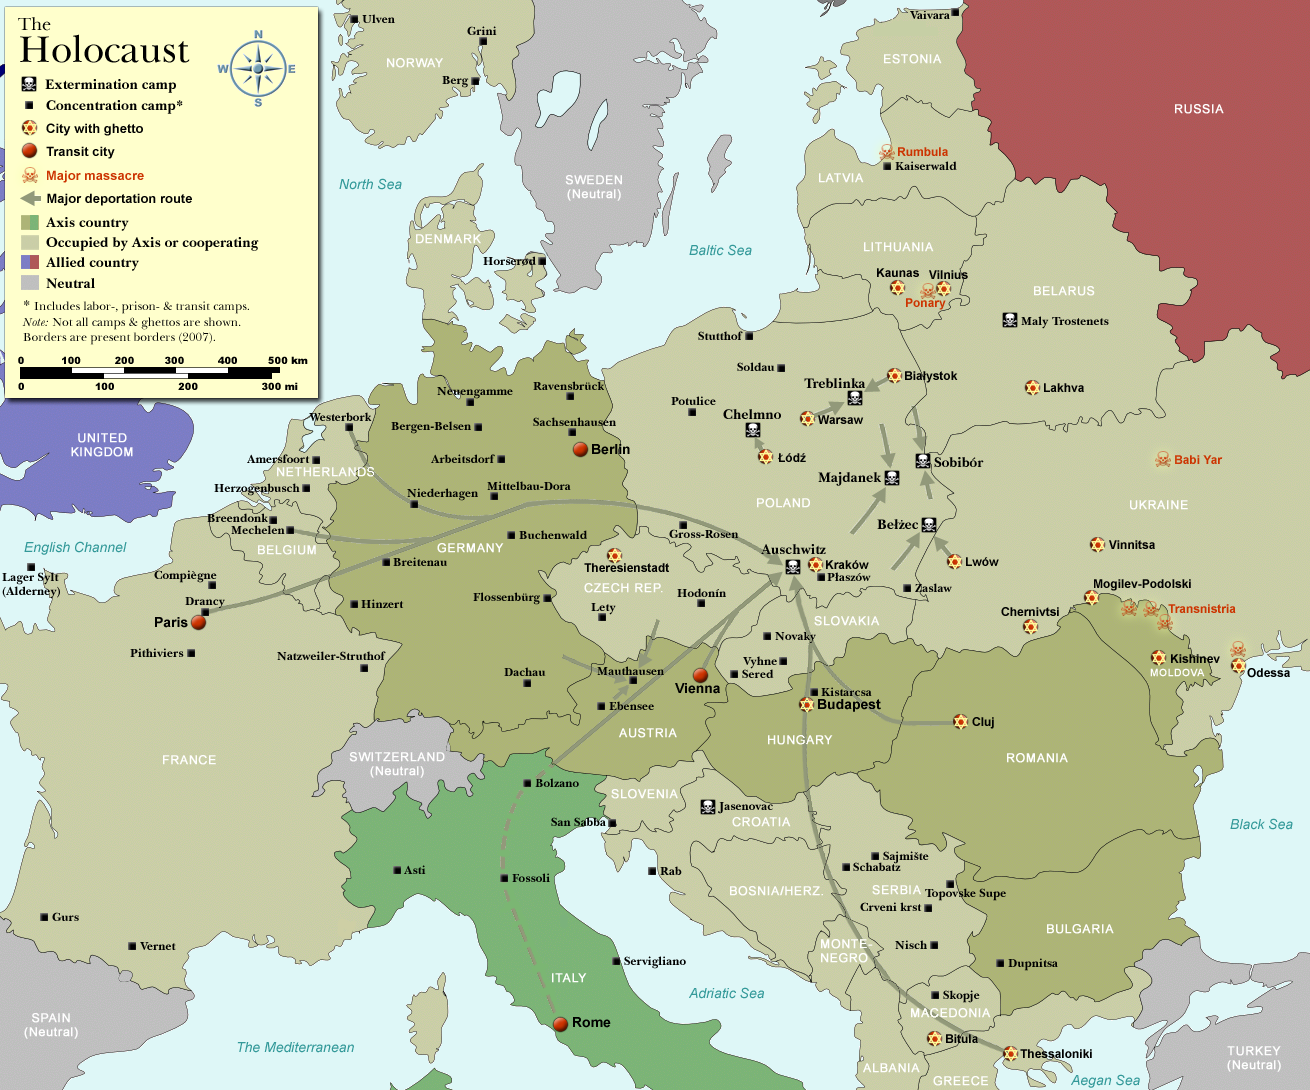 Fileww2 holocaust europe 2007bordersg wikimedia commons fileww2 holocaust europe 2007bordersg sciox Images